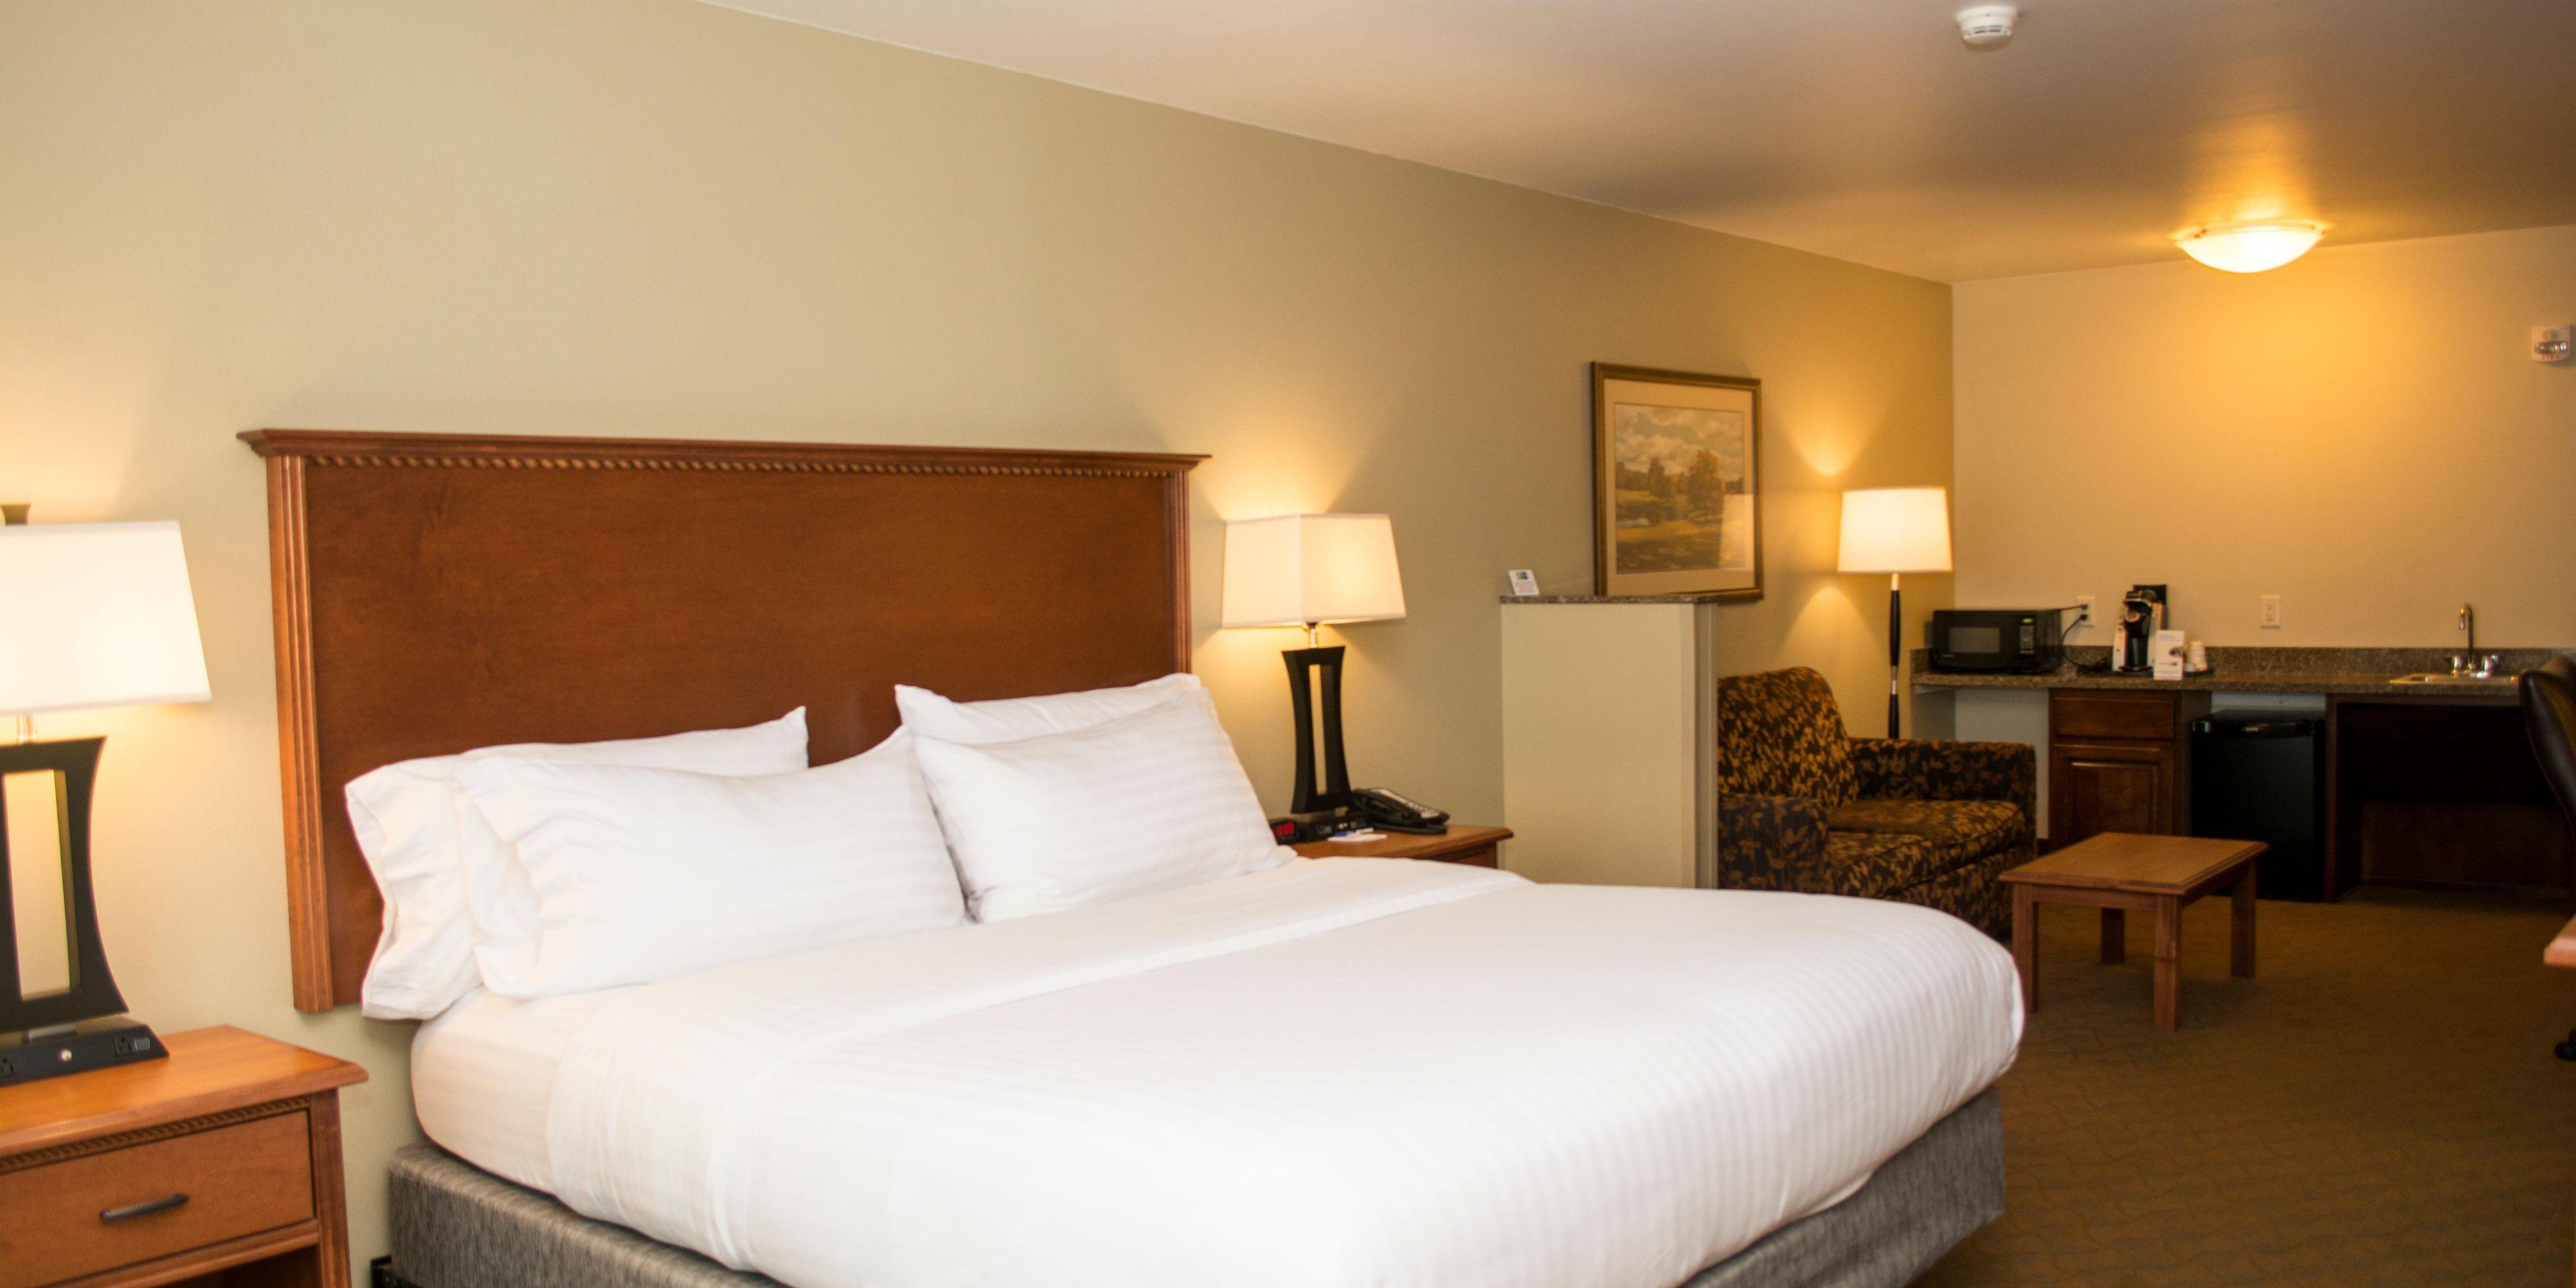 Holiday Inn Express & Suites Mason City Hotel by IHG